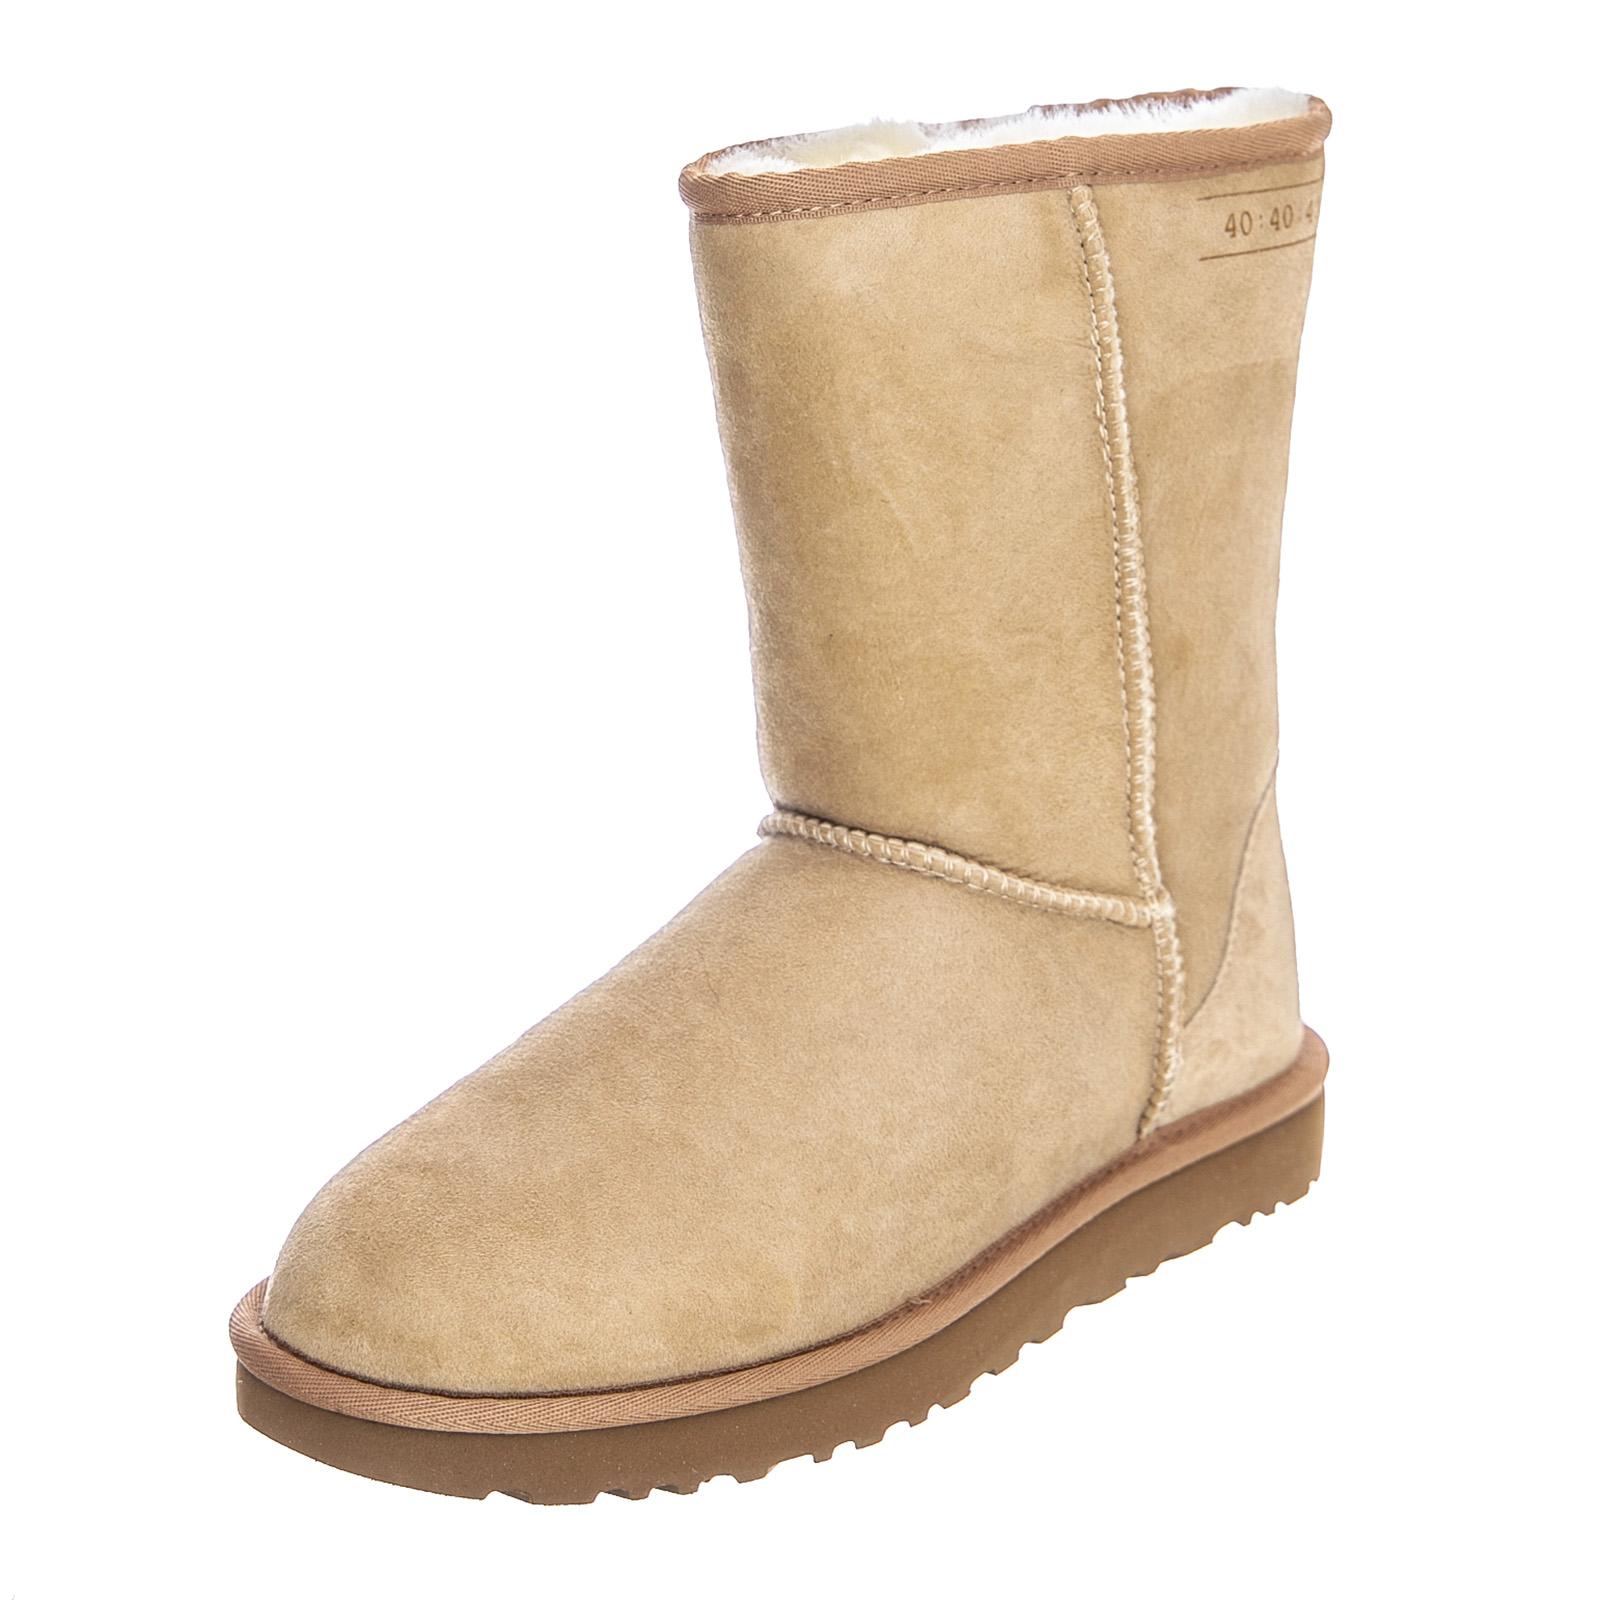 UGG® Classic Short 40:40:40 Stivali per Donna | UGG® IT